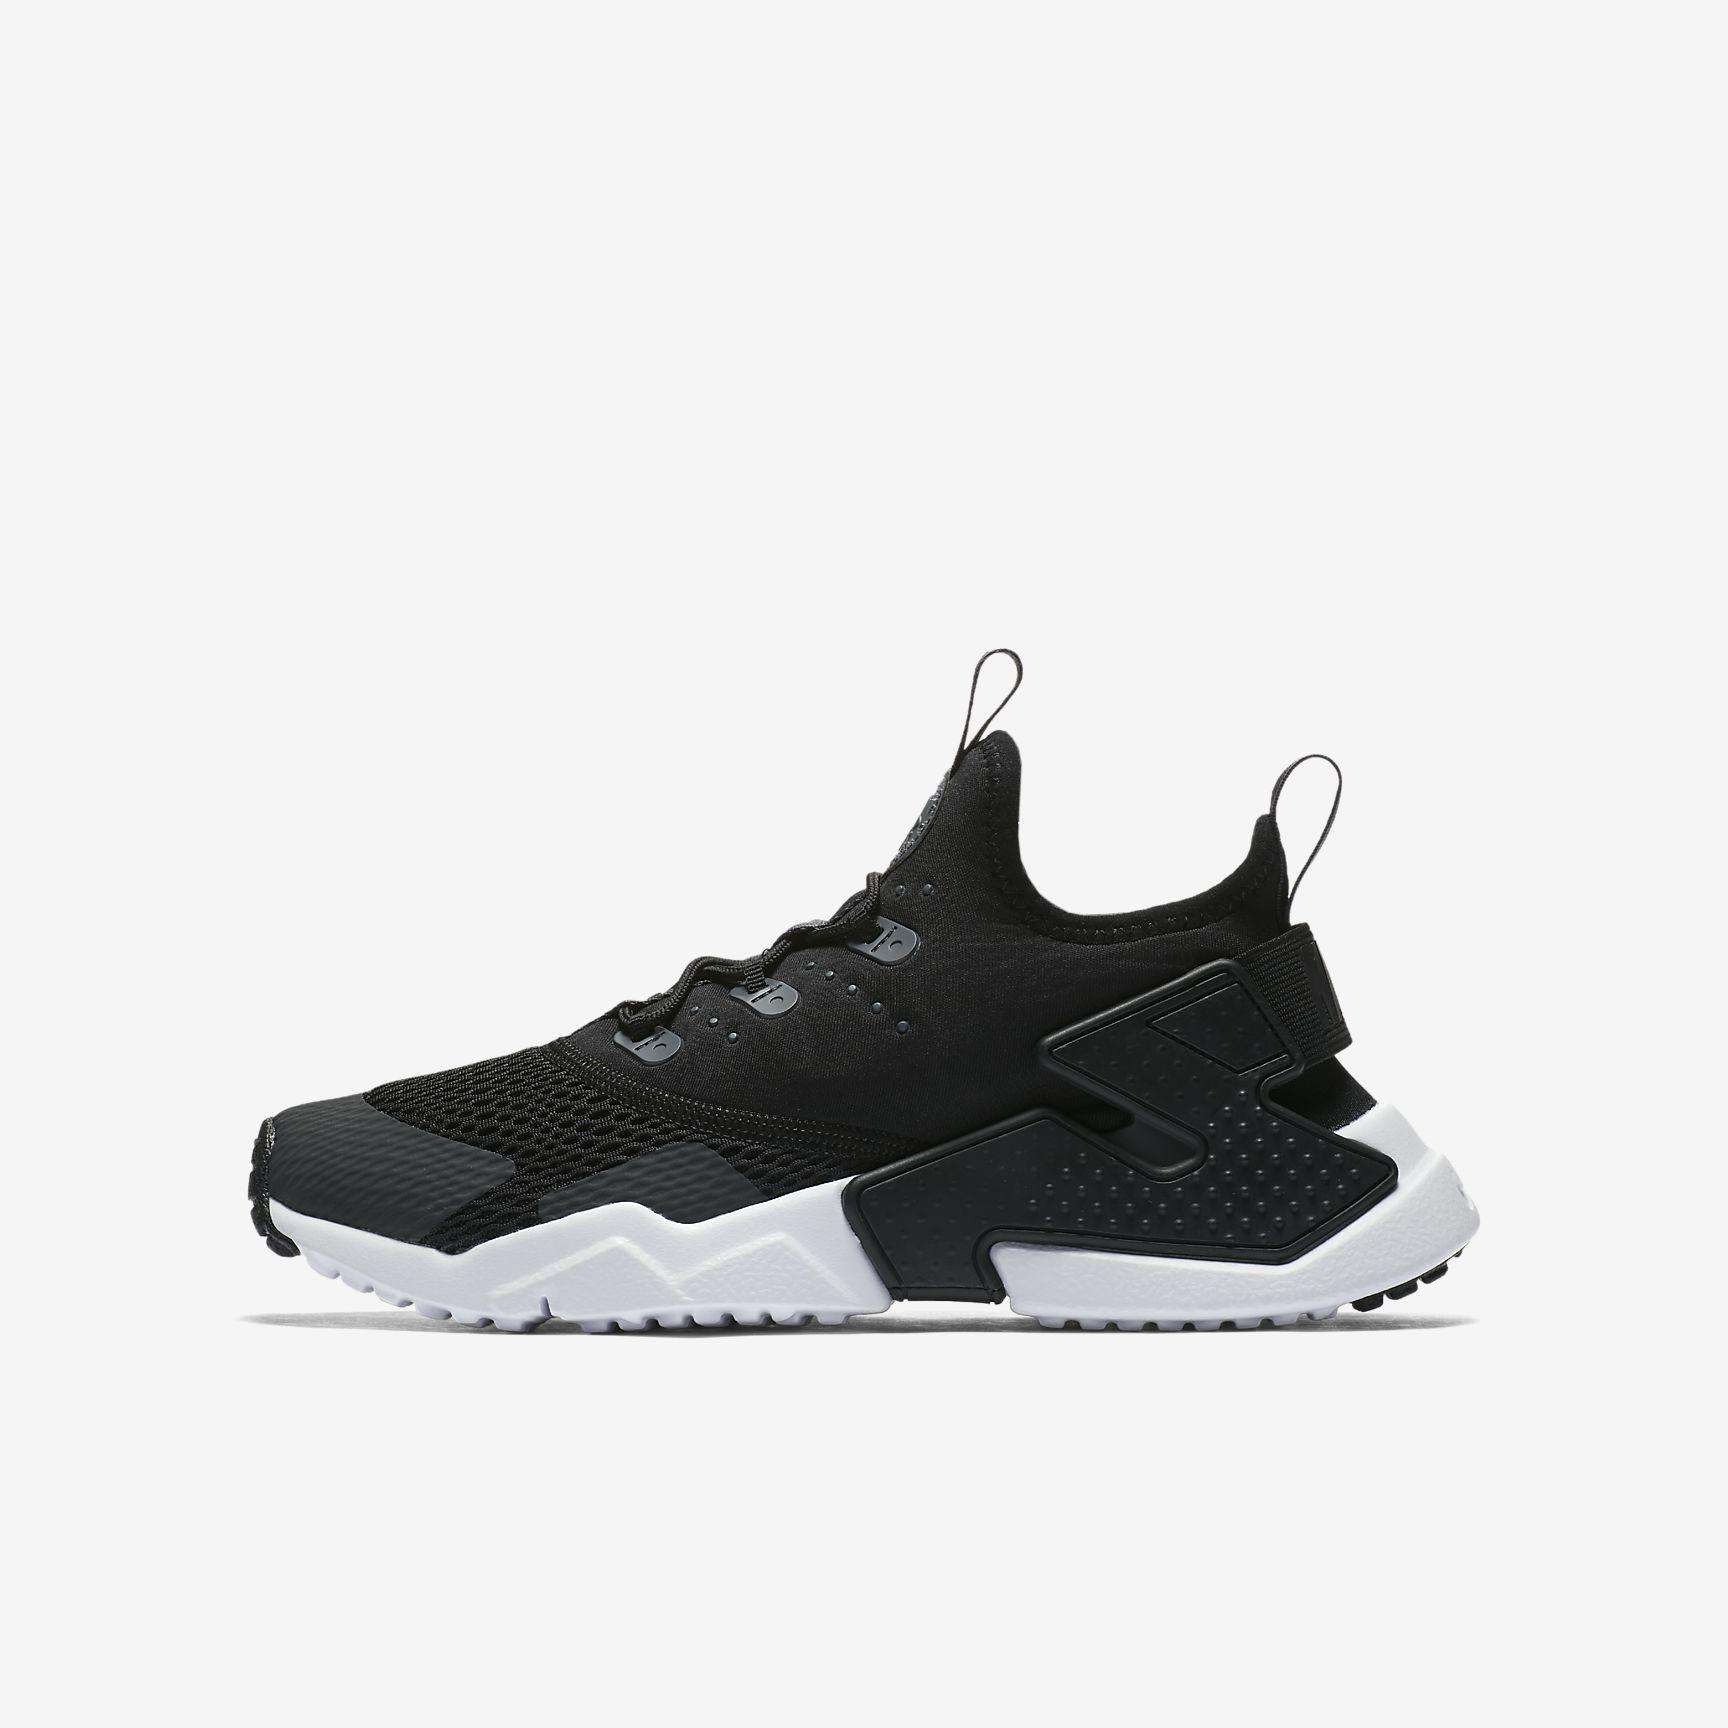 quality design 169df 58e98 Chaussures Homme AIR HUARACHE Drift Noir Anthracite Blanc Anthracite